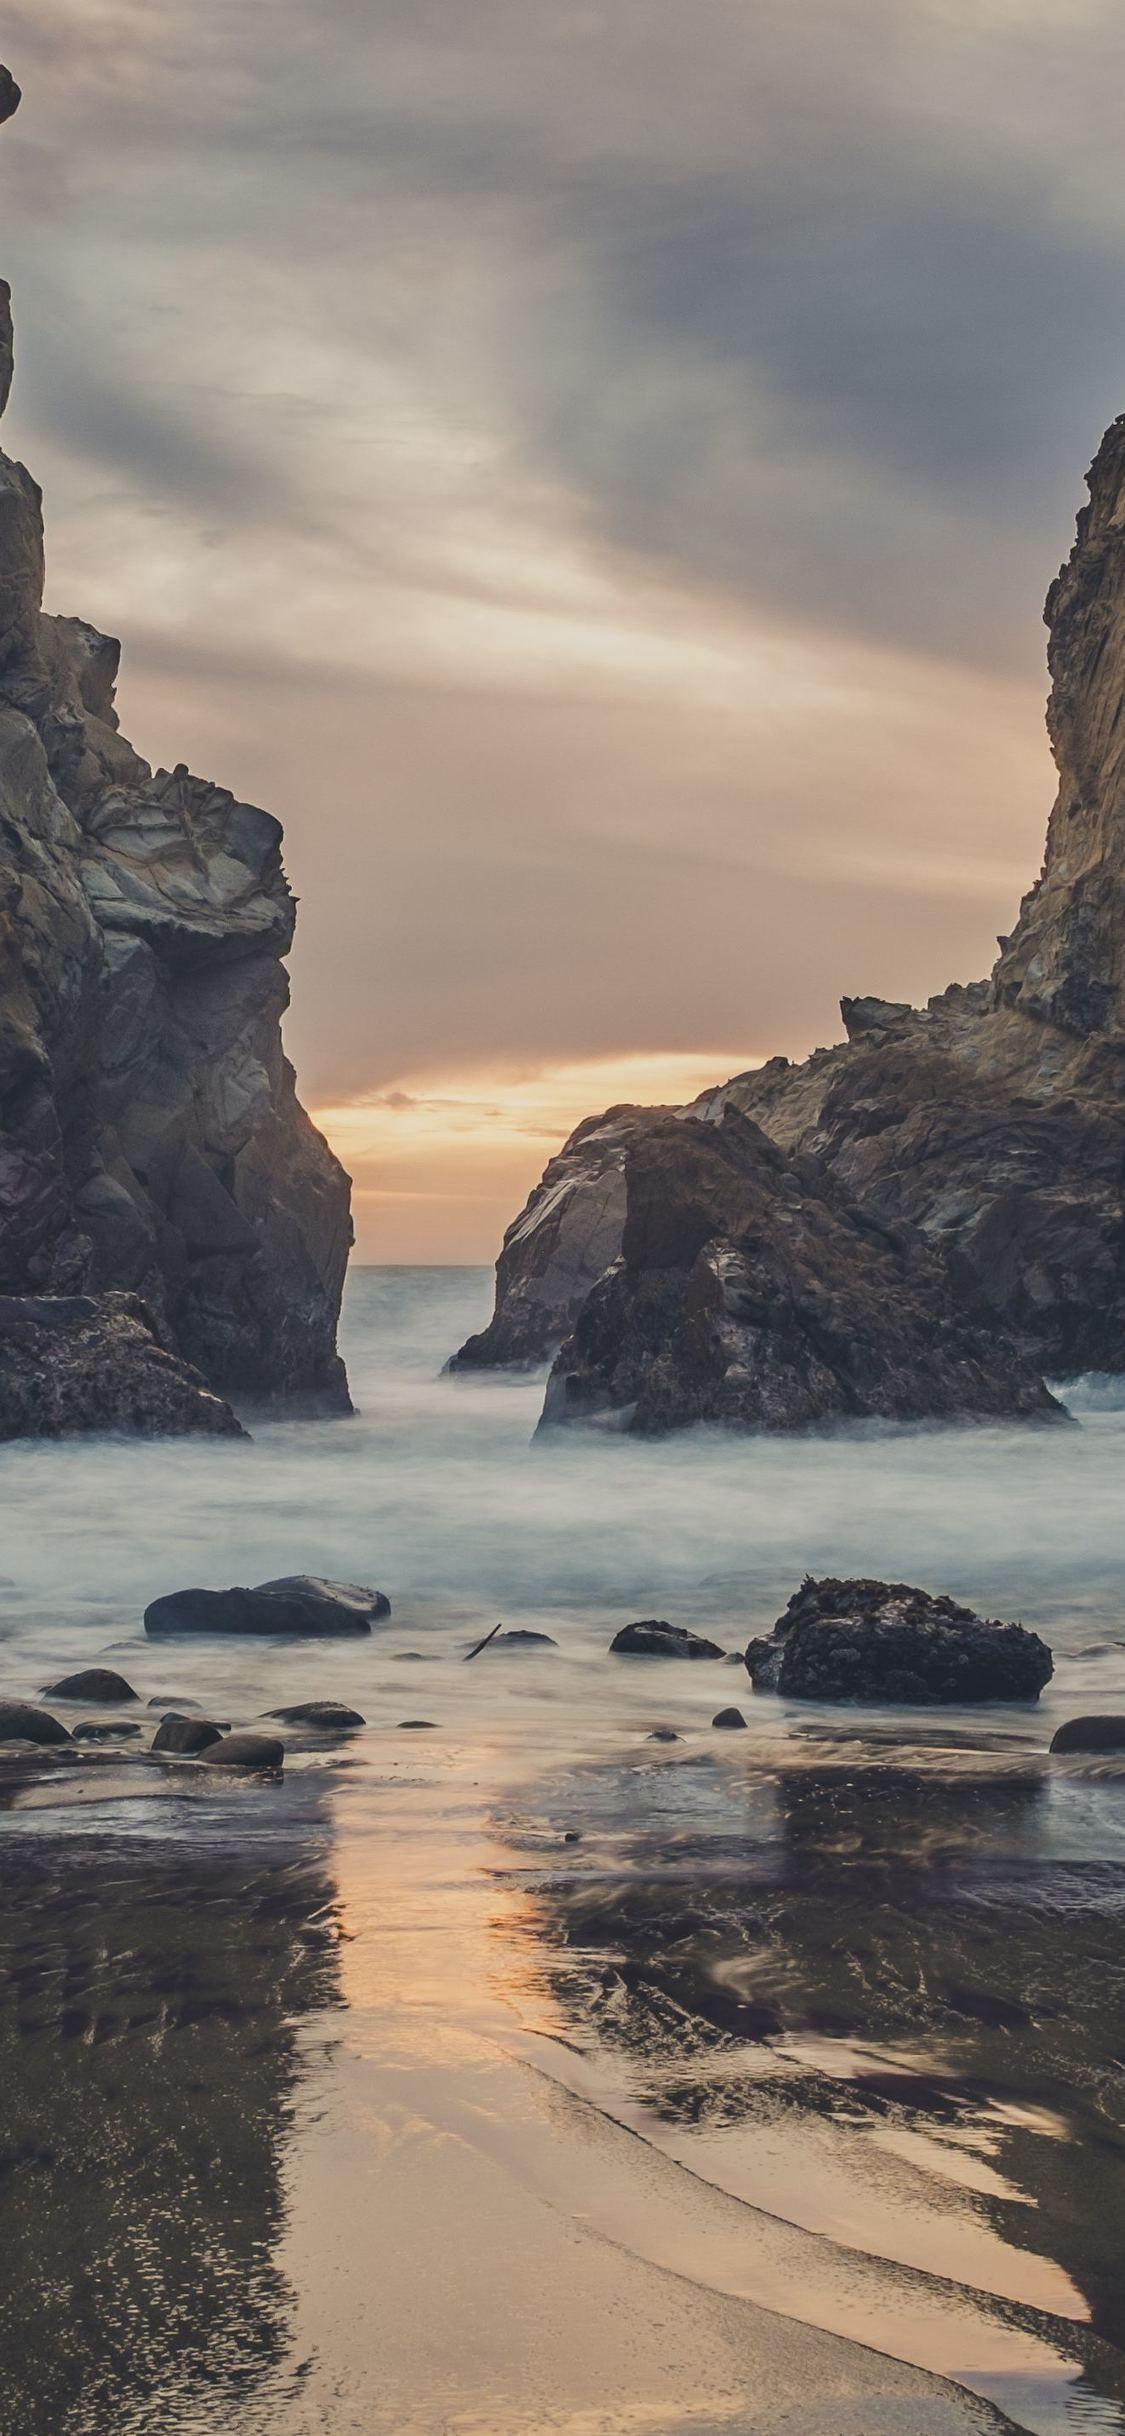 4k Wallpaper Iphone Beach Nature photography, Ocean